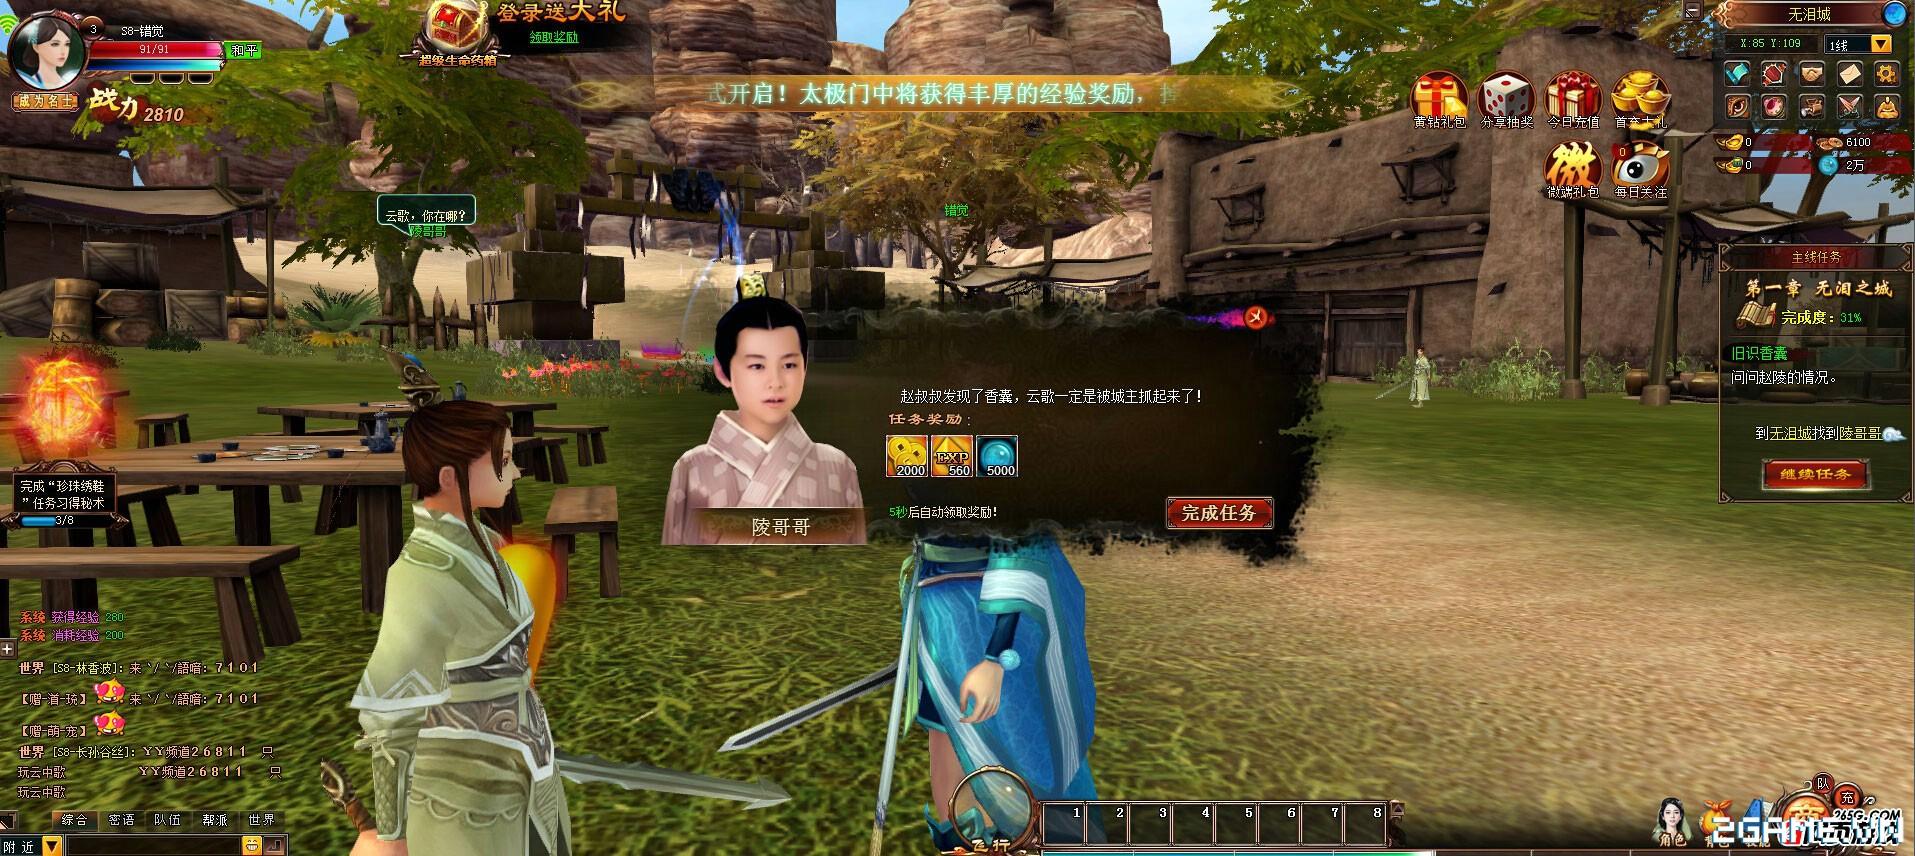 2game_hinh_anh_webgame_van_trung_ca_vtc_game_1.jpg (1915×856)